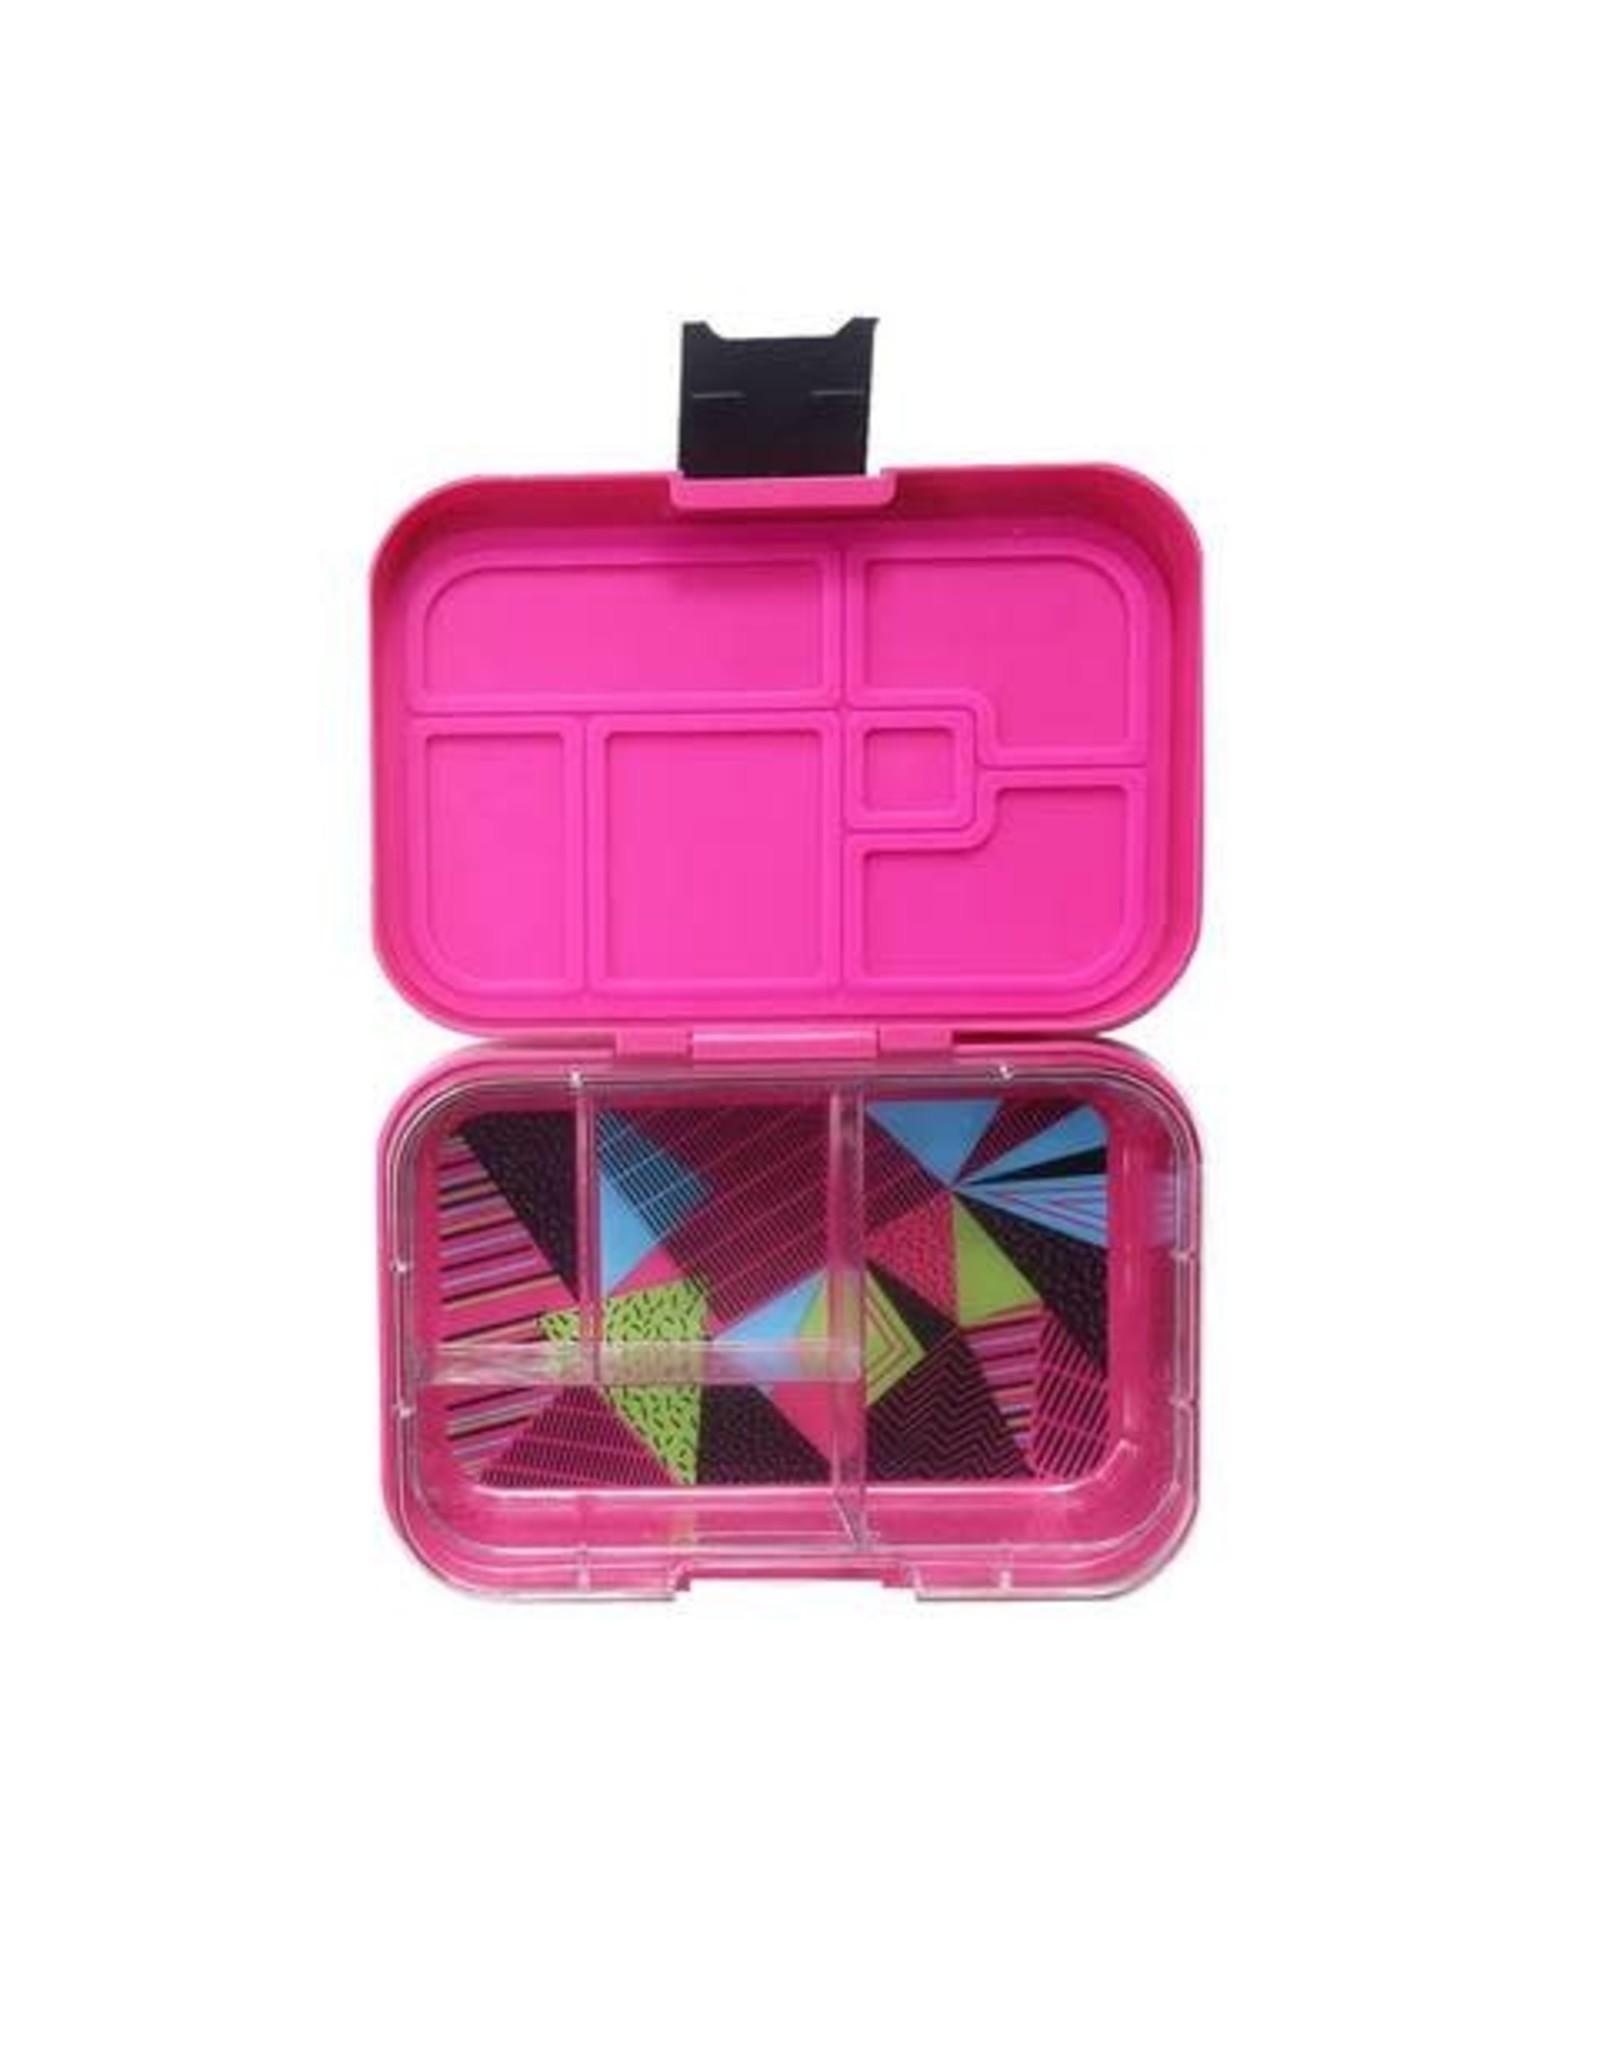 MunchBox MunchBox Mega4, Fuchsia Tint